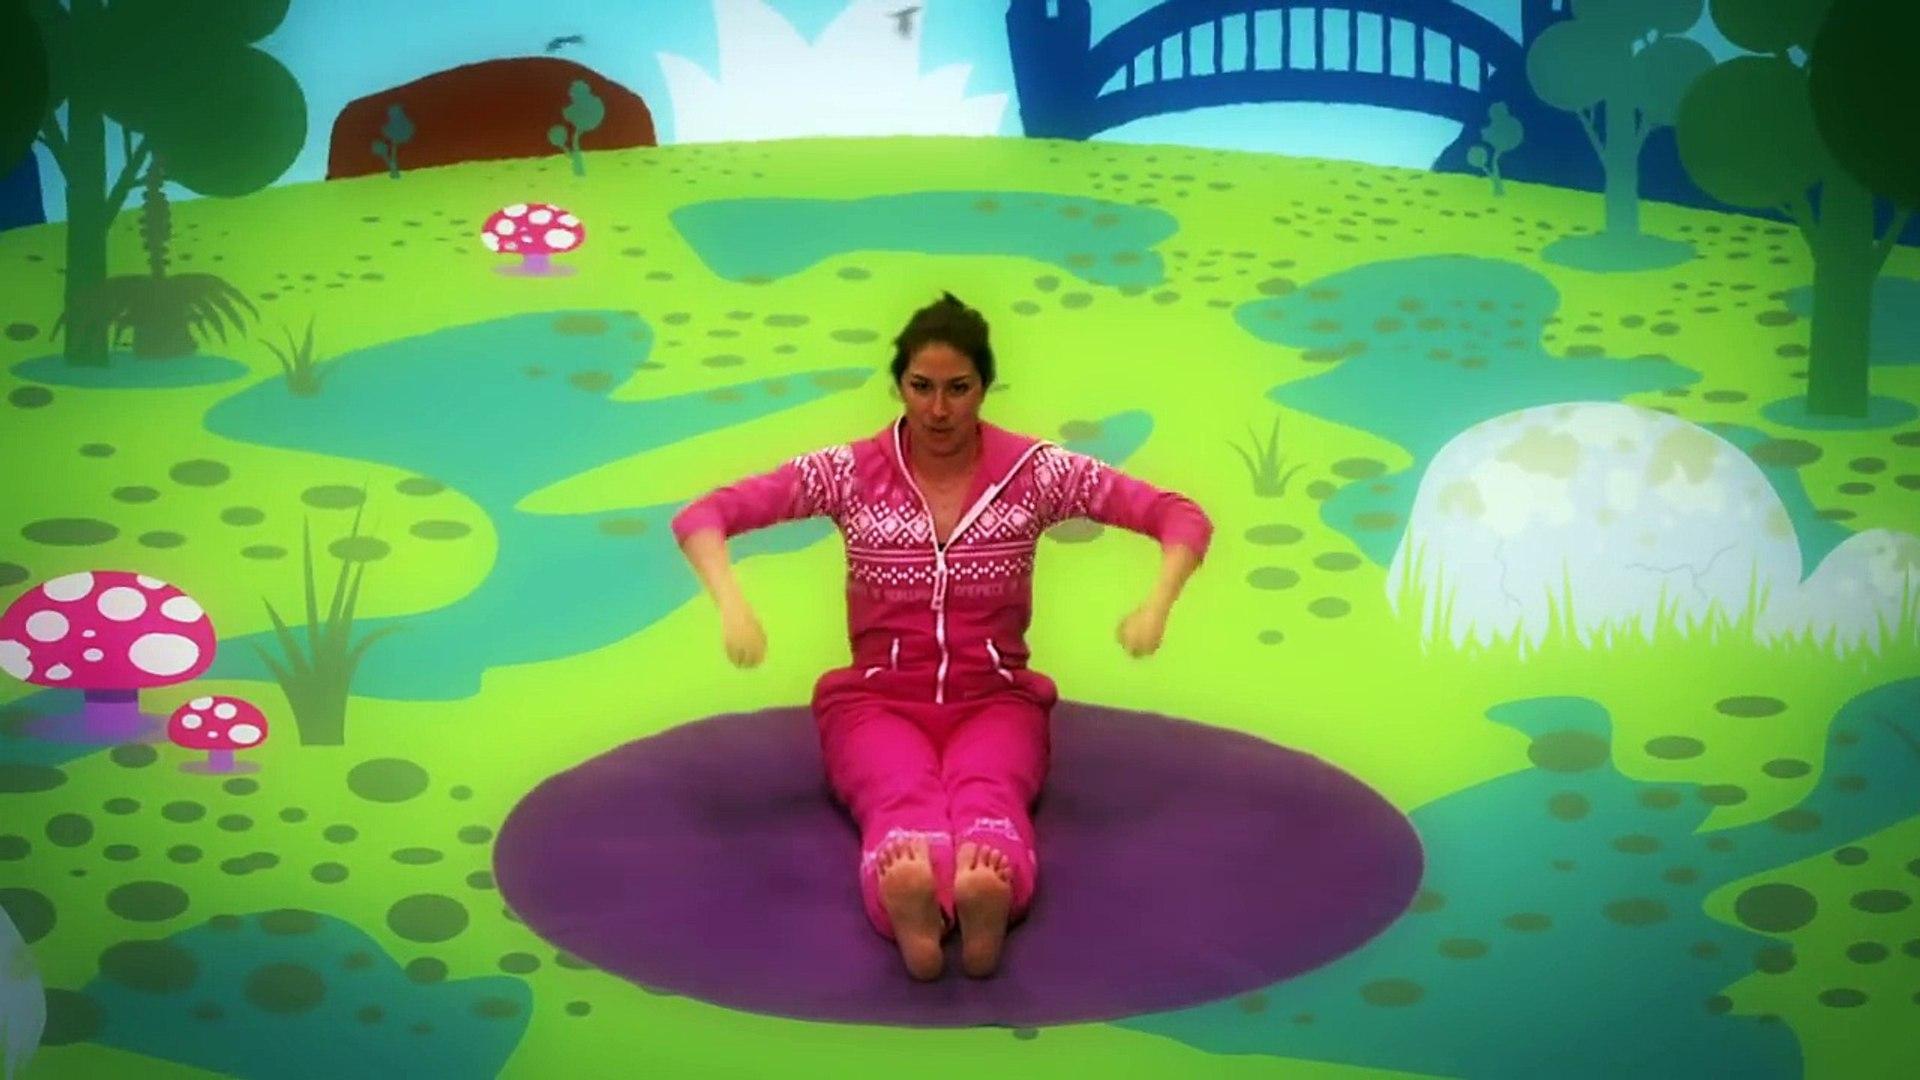 Kickapoo The Kangaroo A Cosmic Kids Yoga Adventure Video Dailymotion